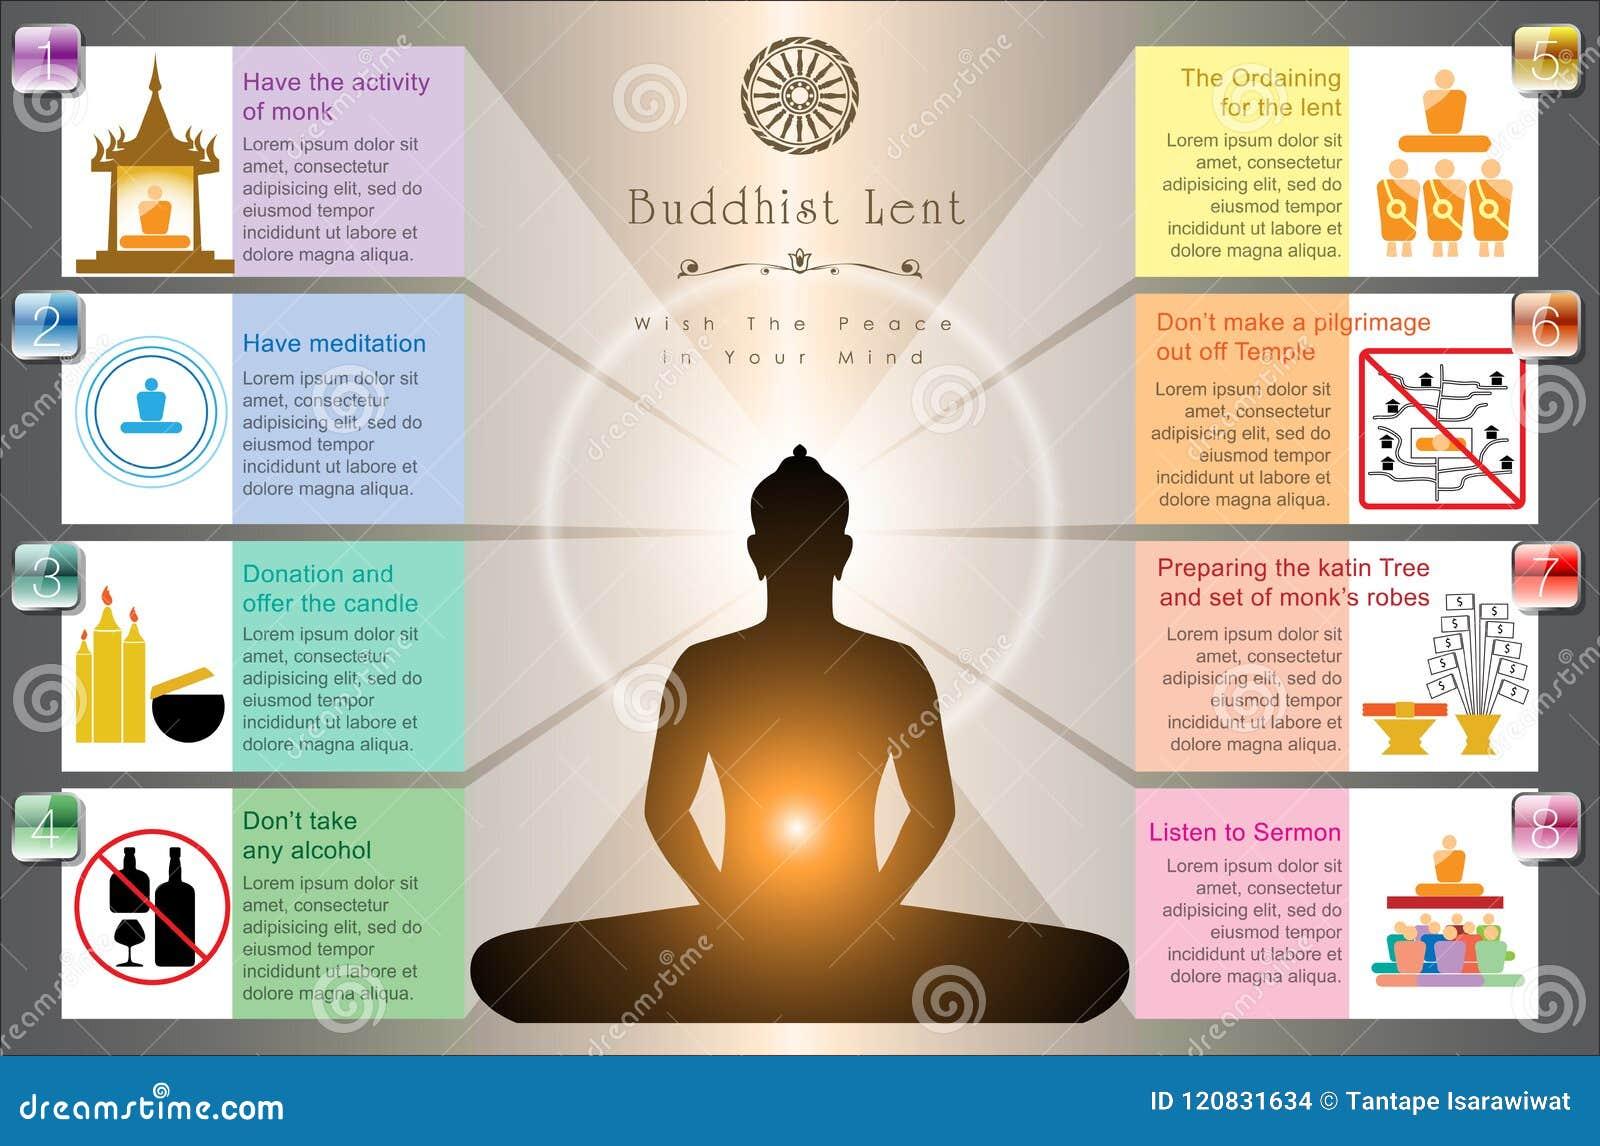 Lent Artwork Template budista